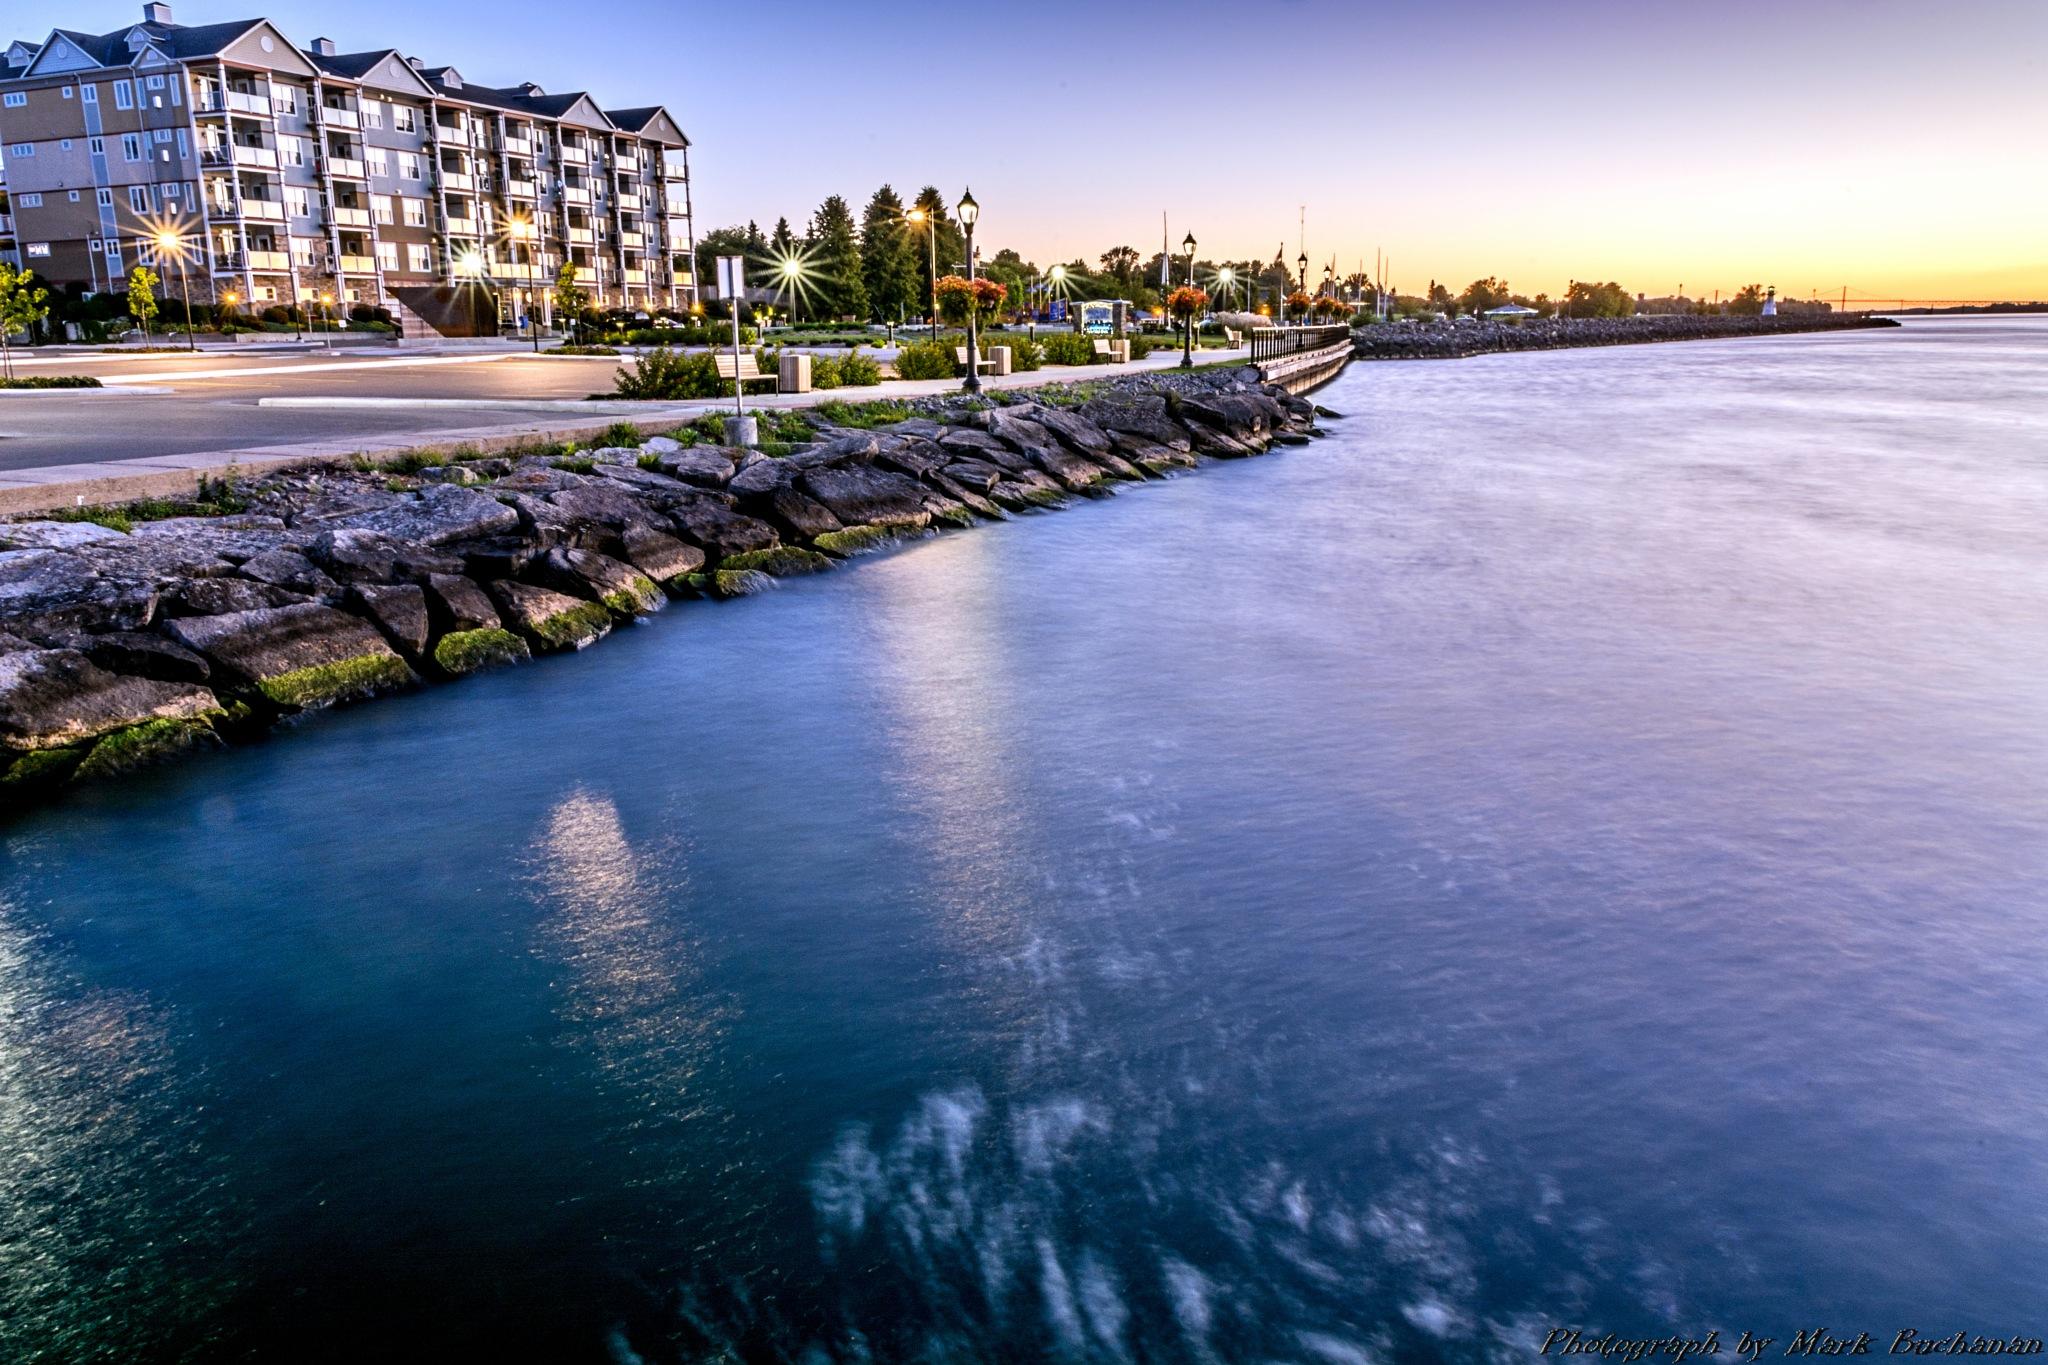 Harbour sunrise #2 by Mark Buchanan